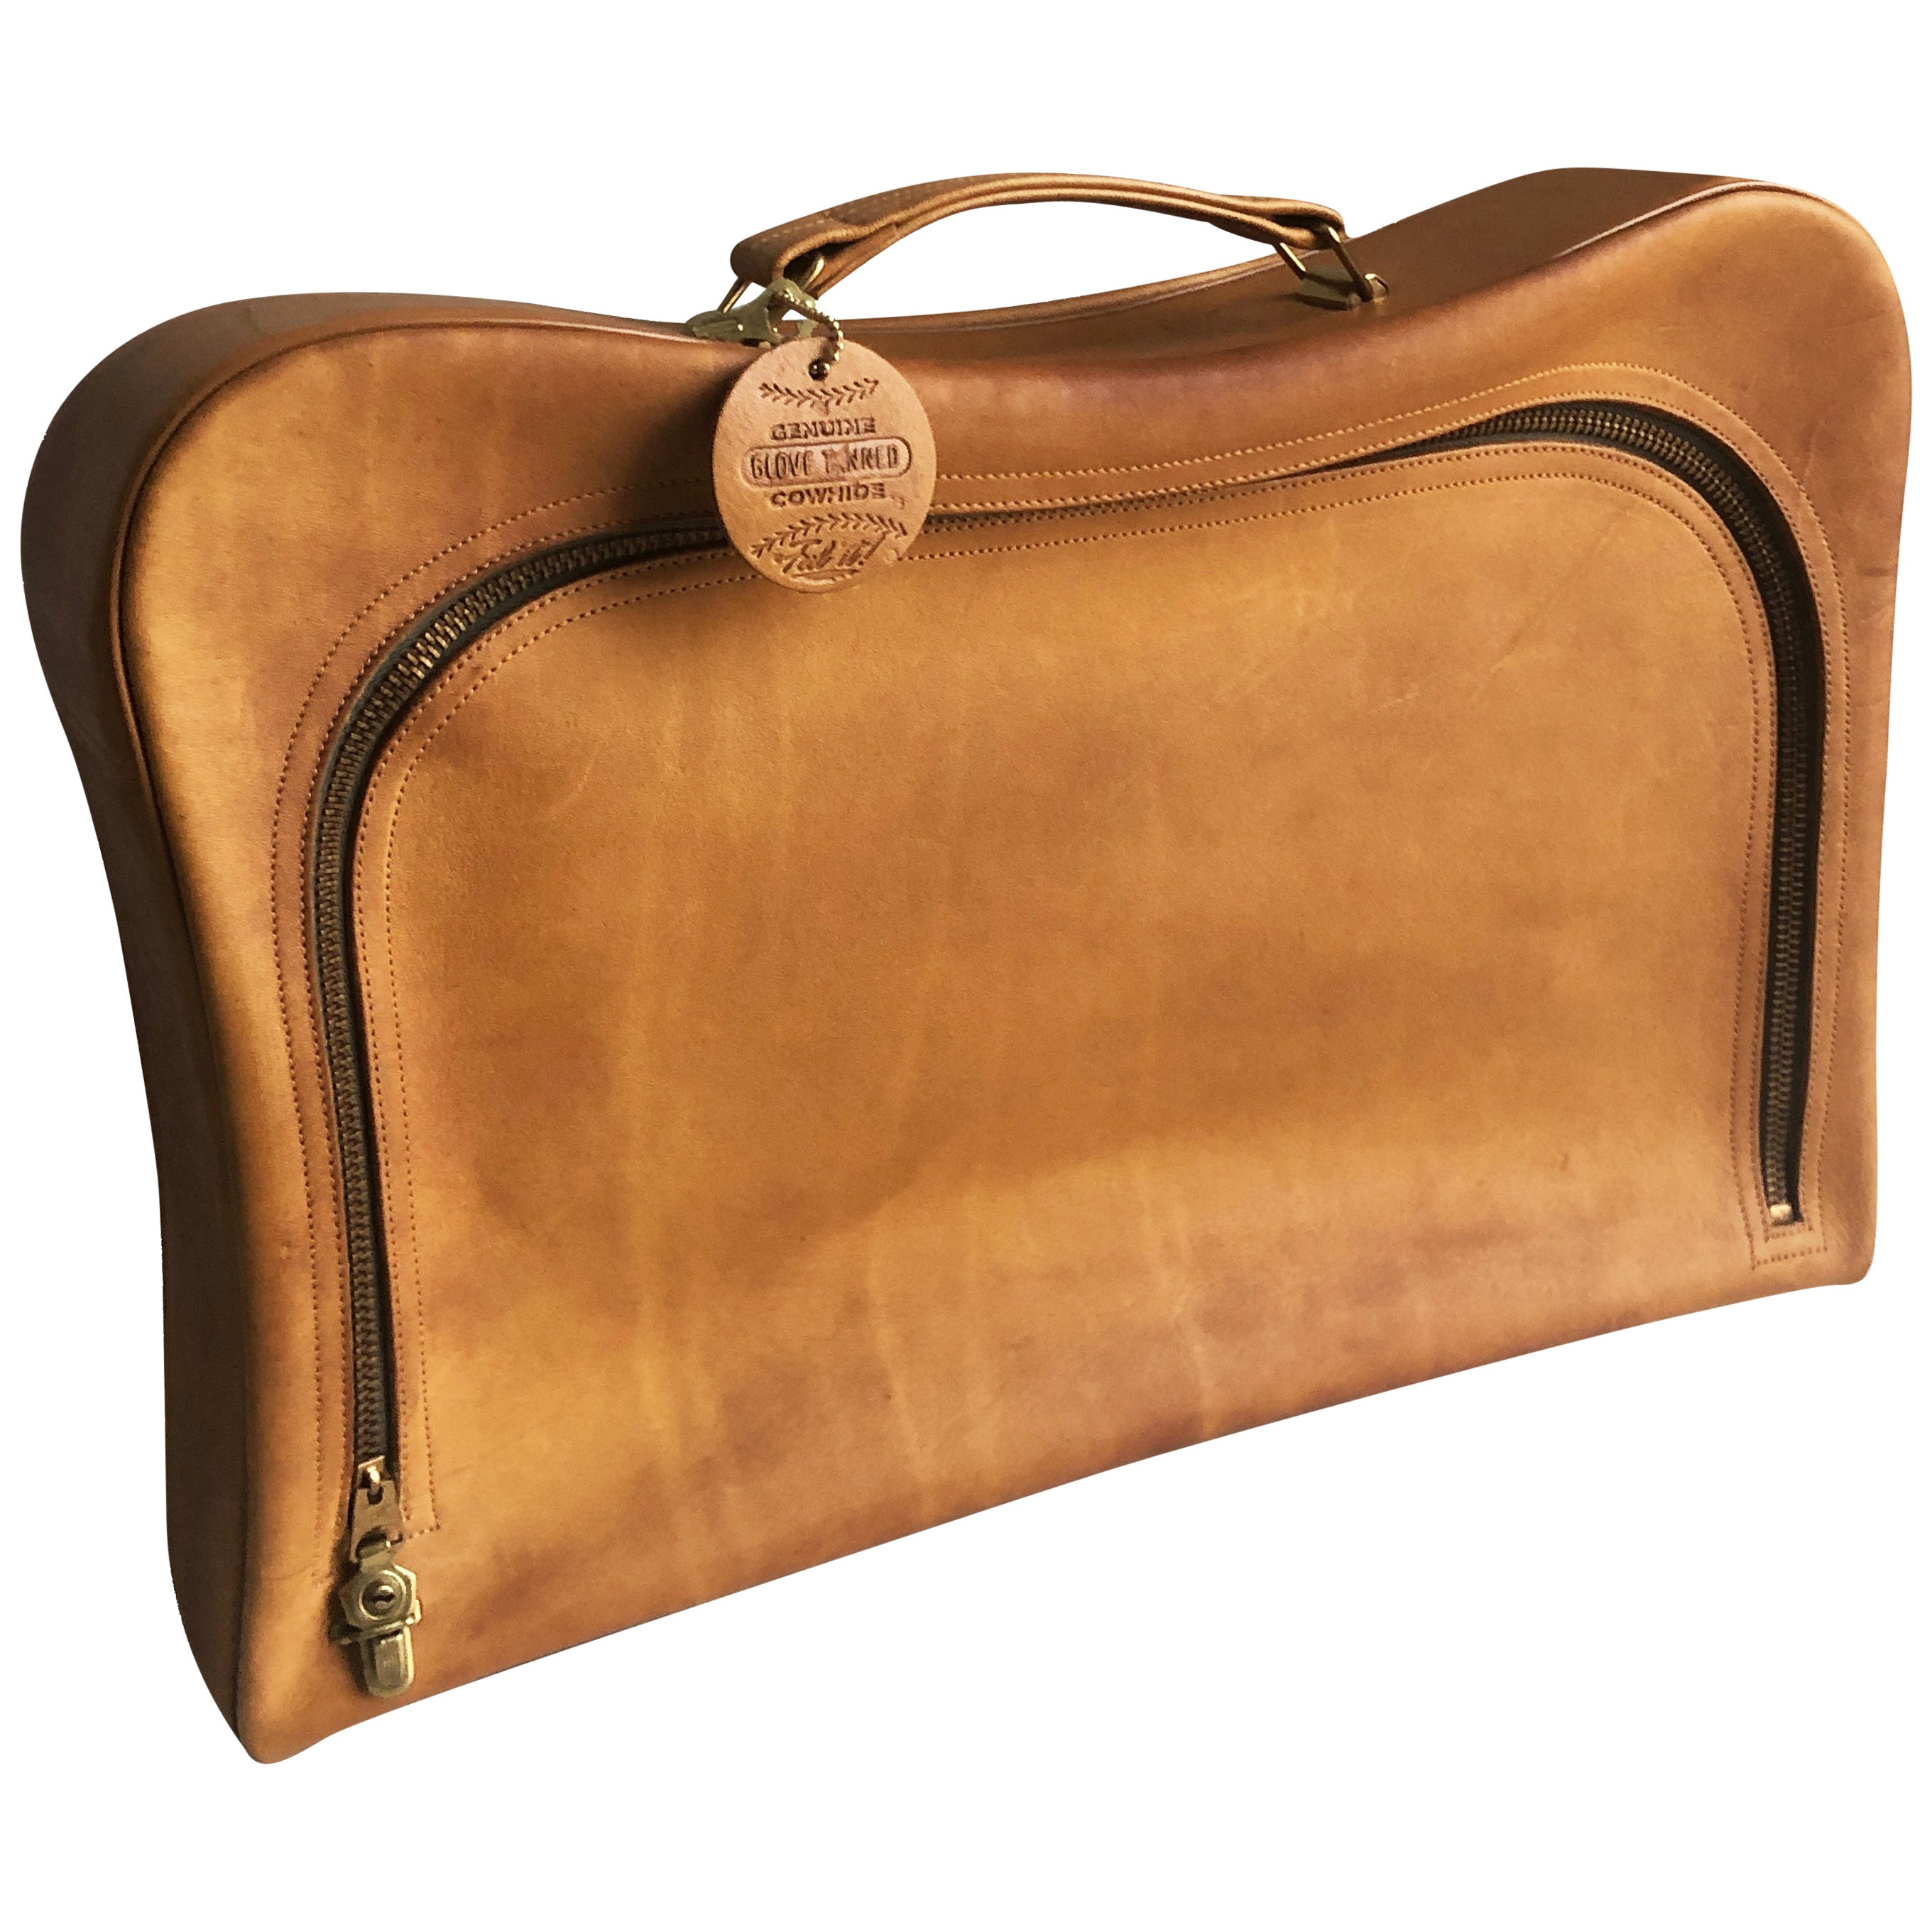 Bonnie Cashin for Coach Diplomat Attache Briefcase with Rare Baseball Tag 1960s